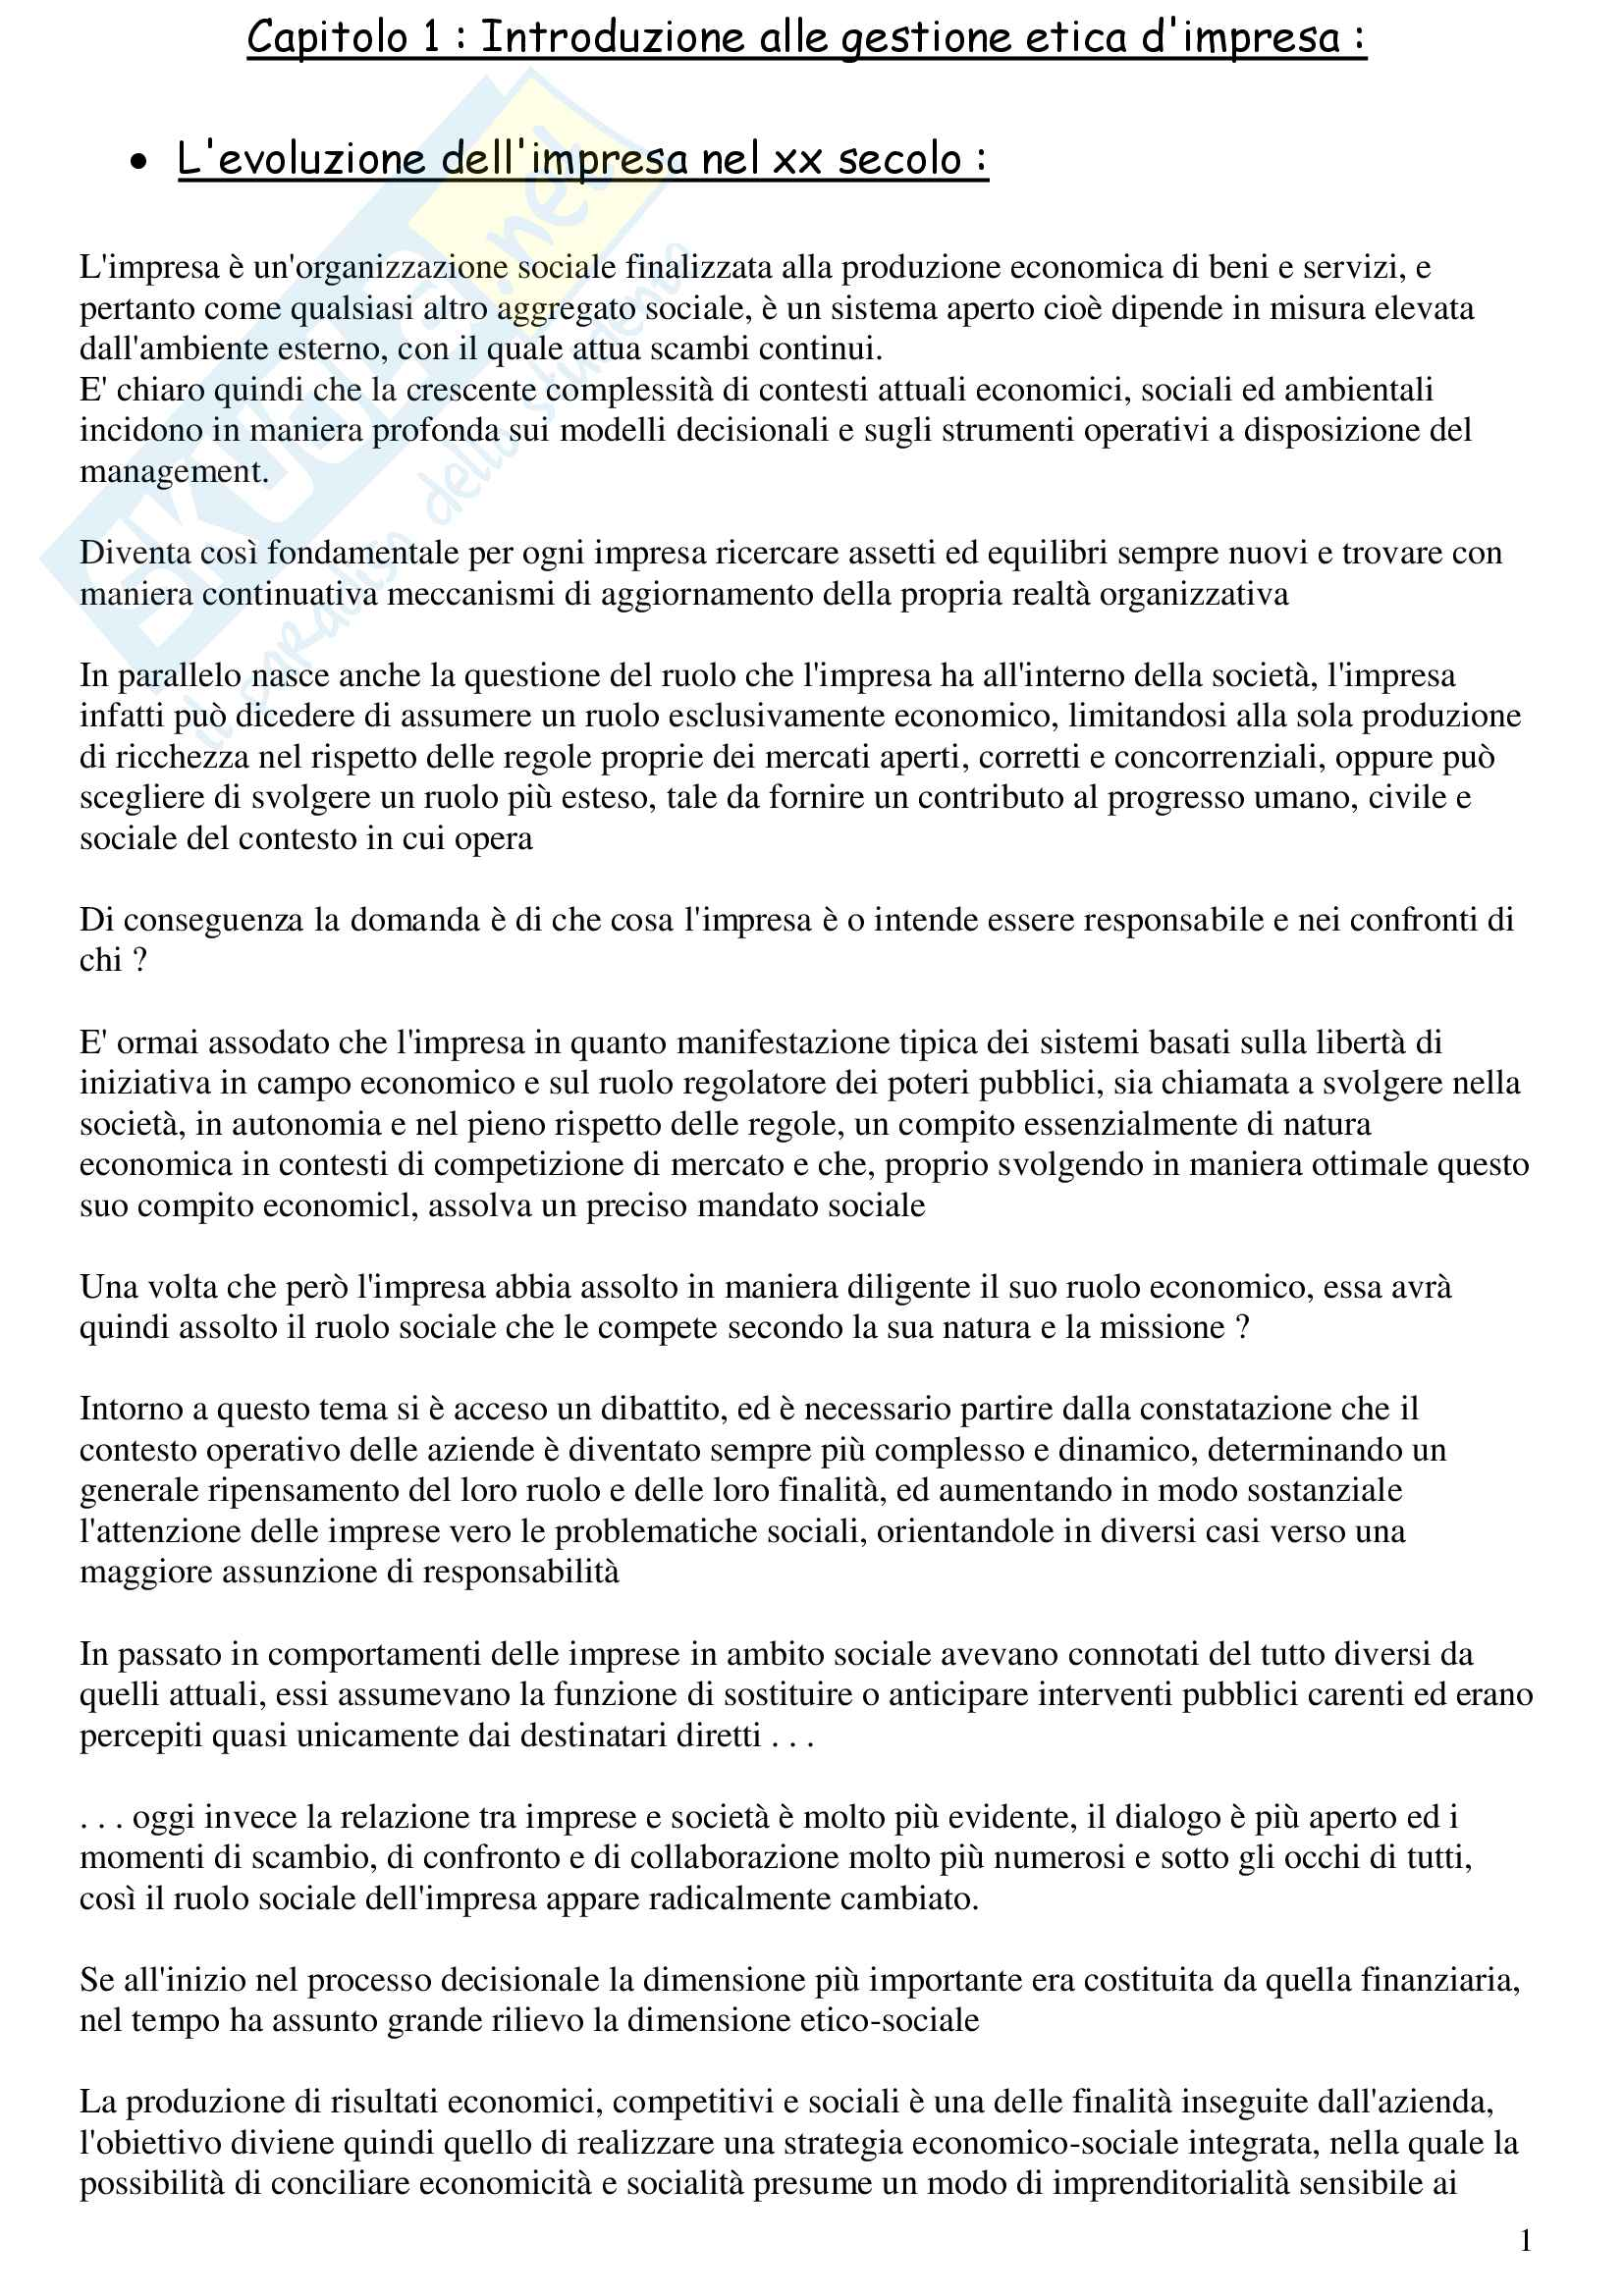 GEI Riassunti Modulo Renzi